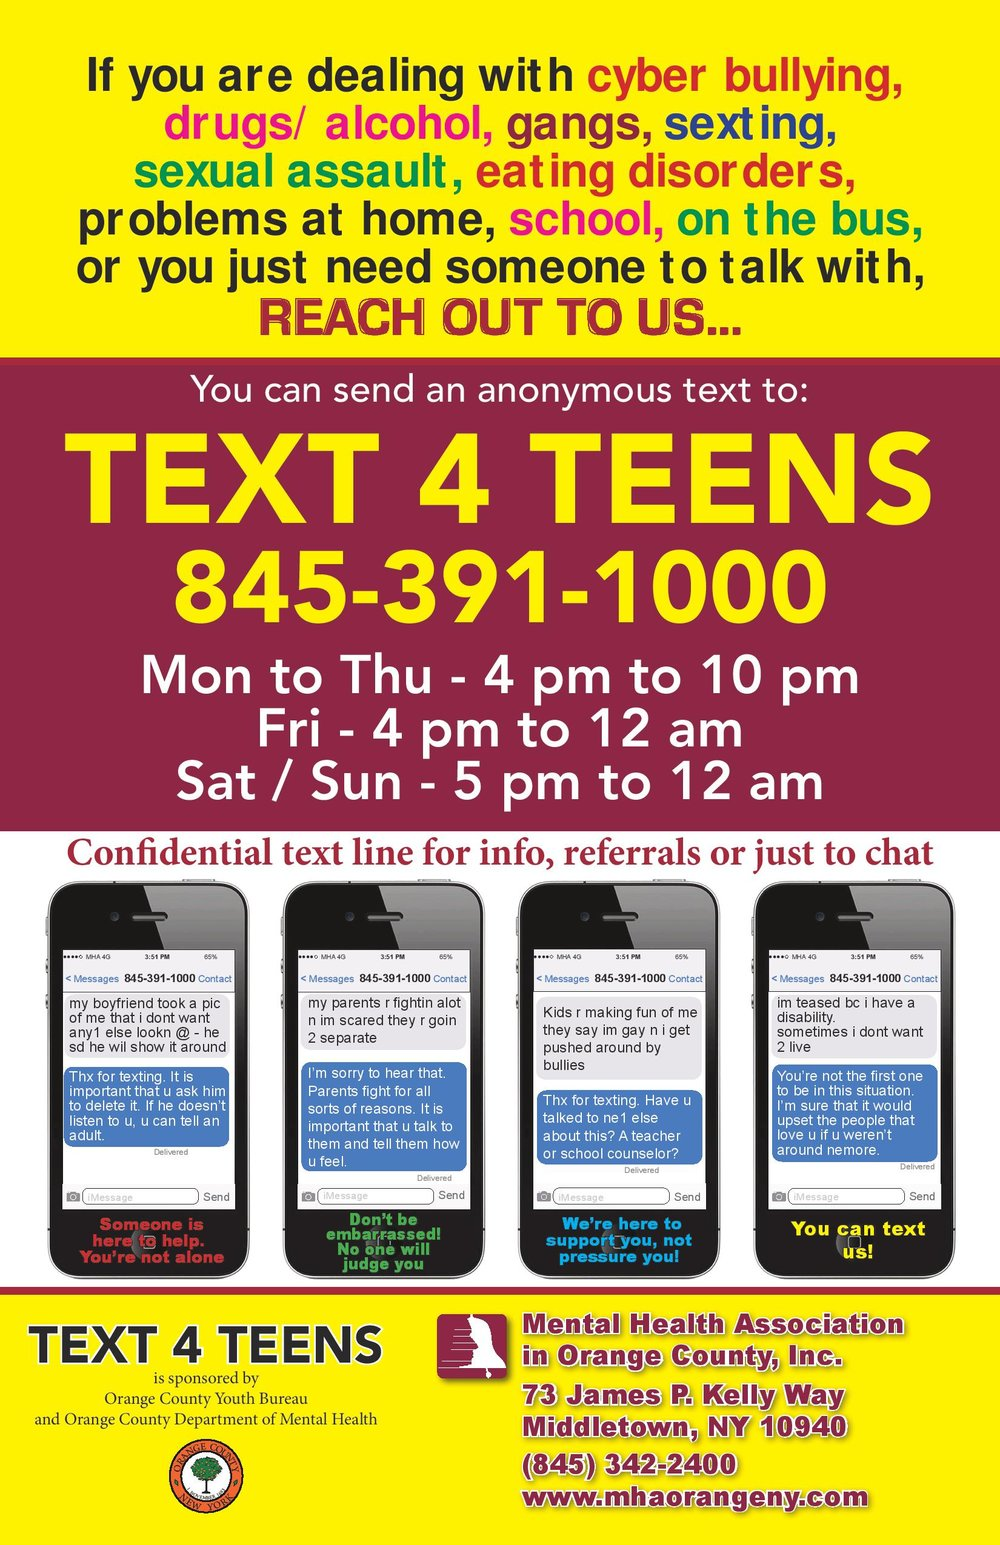 MHA_texting_poster-page-001.jpg